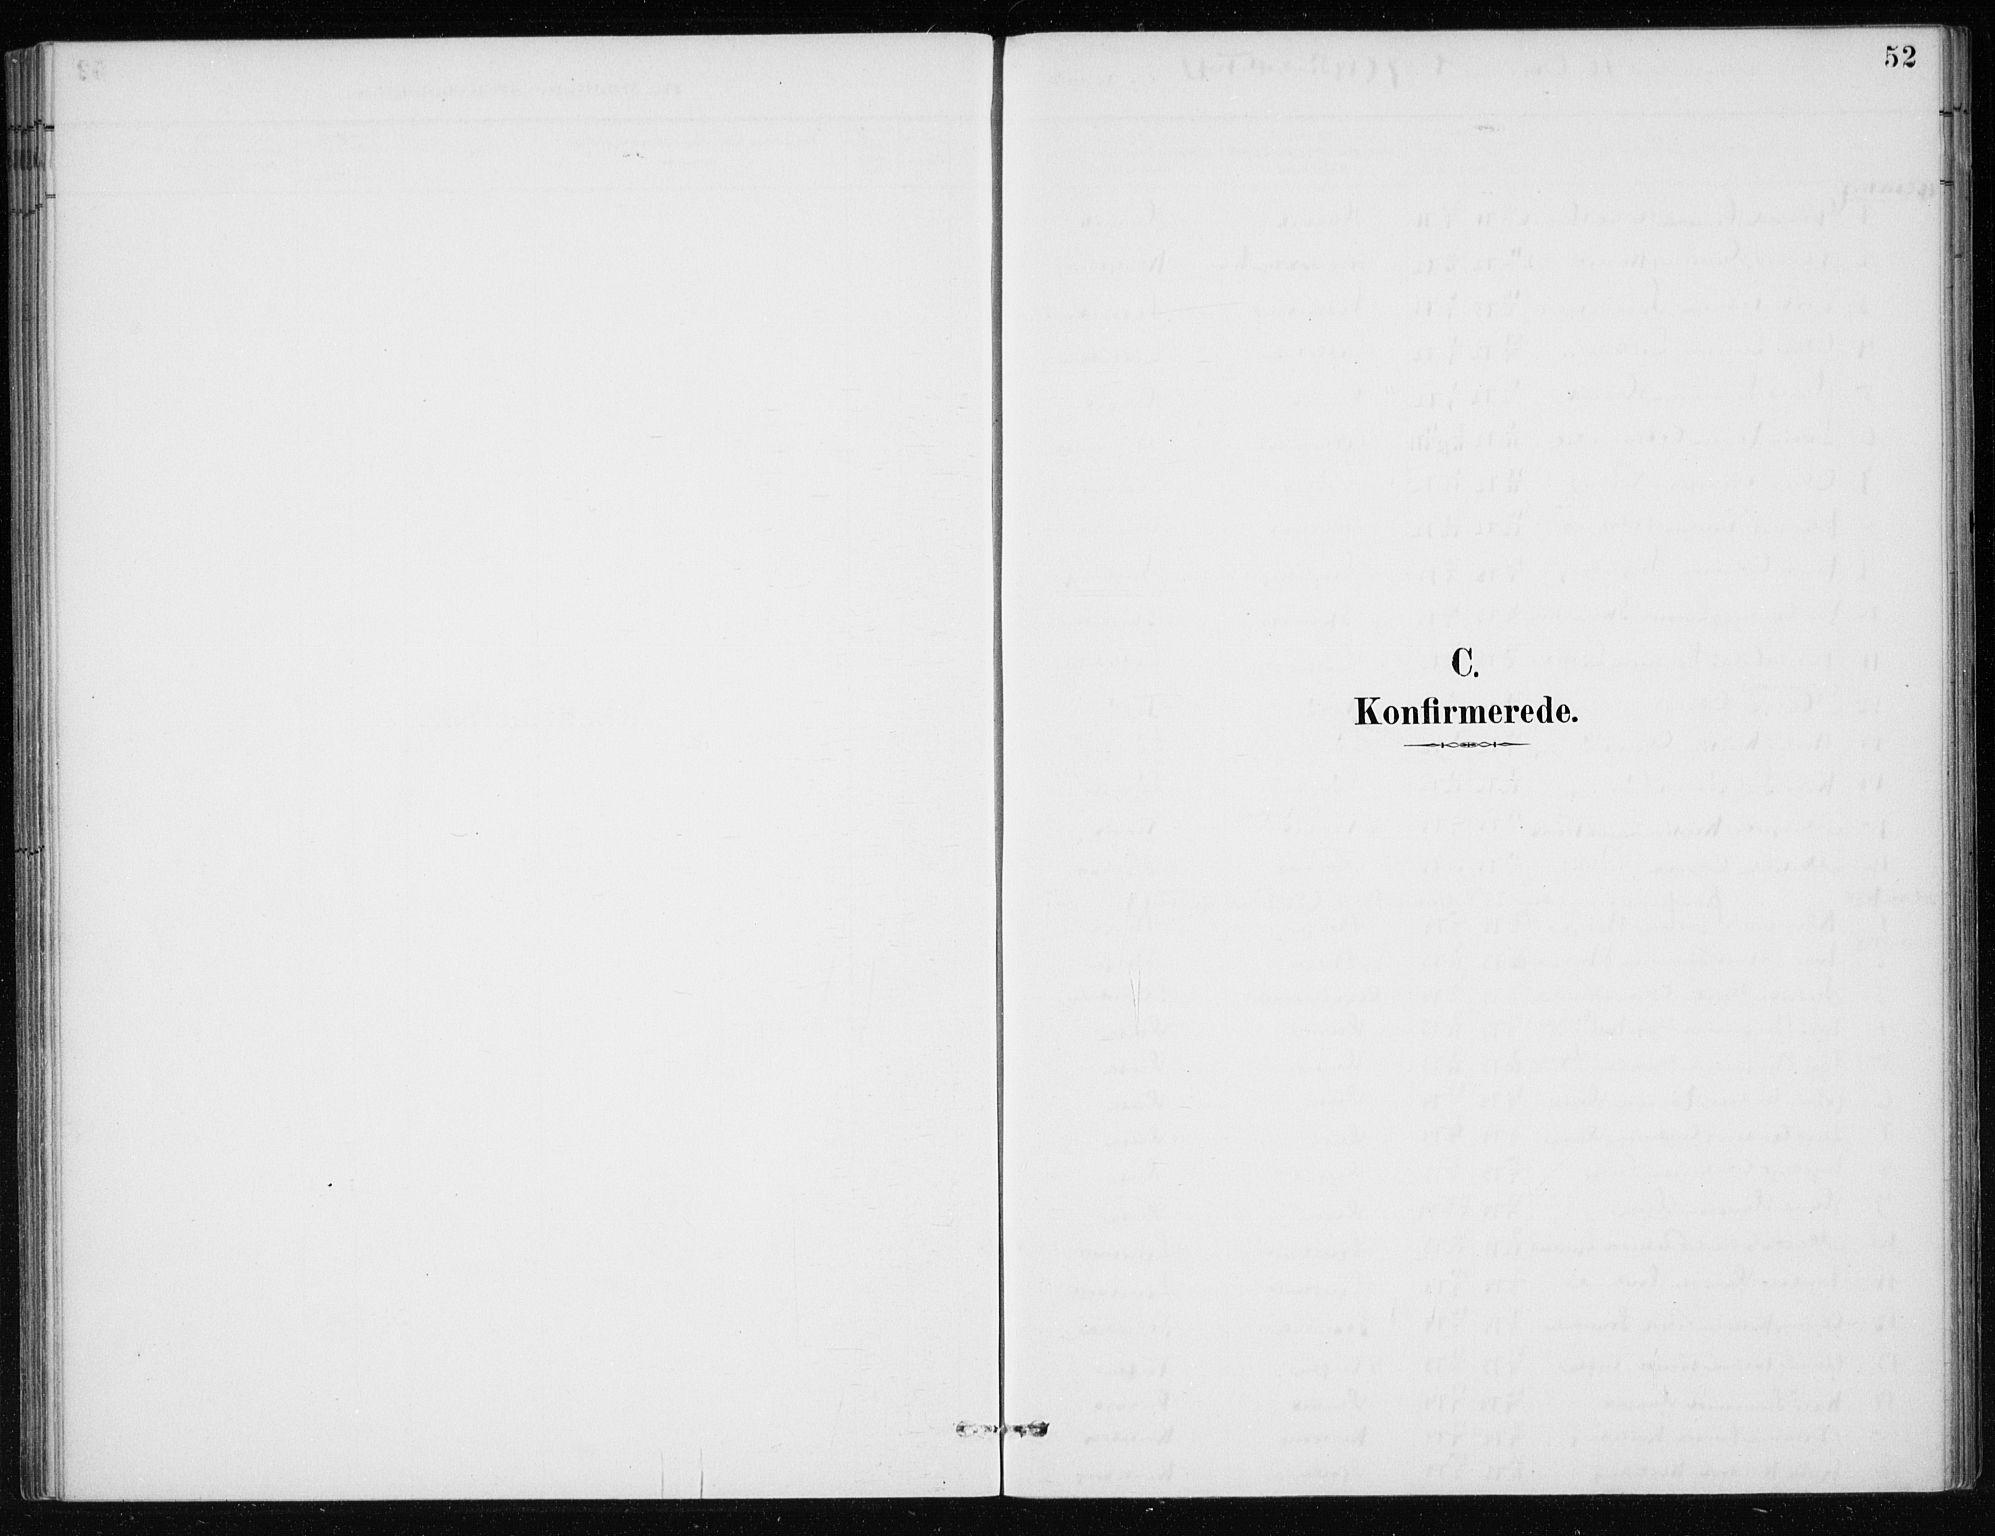 SAB, Kvinnherad Sokneprestembete, H/Haa: Ministerialbok nr. E 1, 1887-1912, s. 52